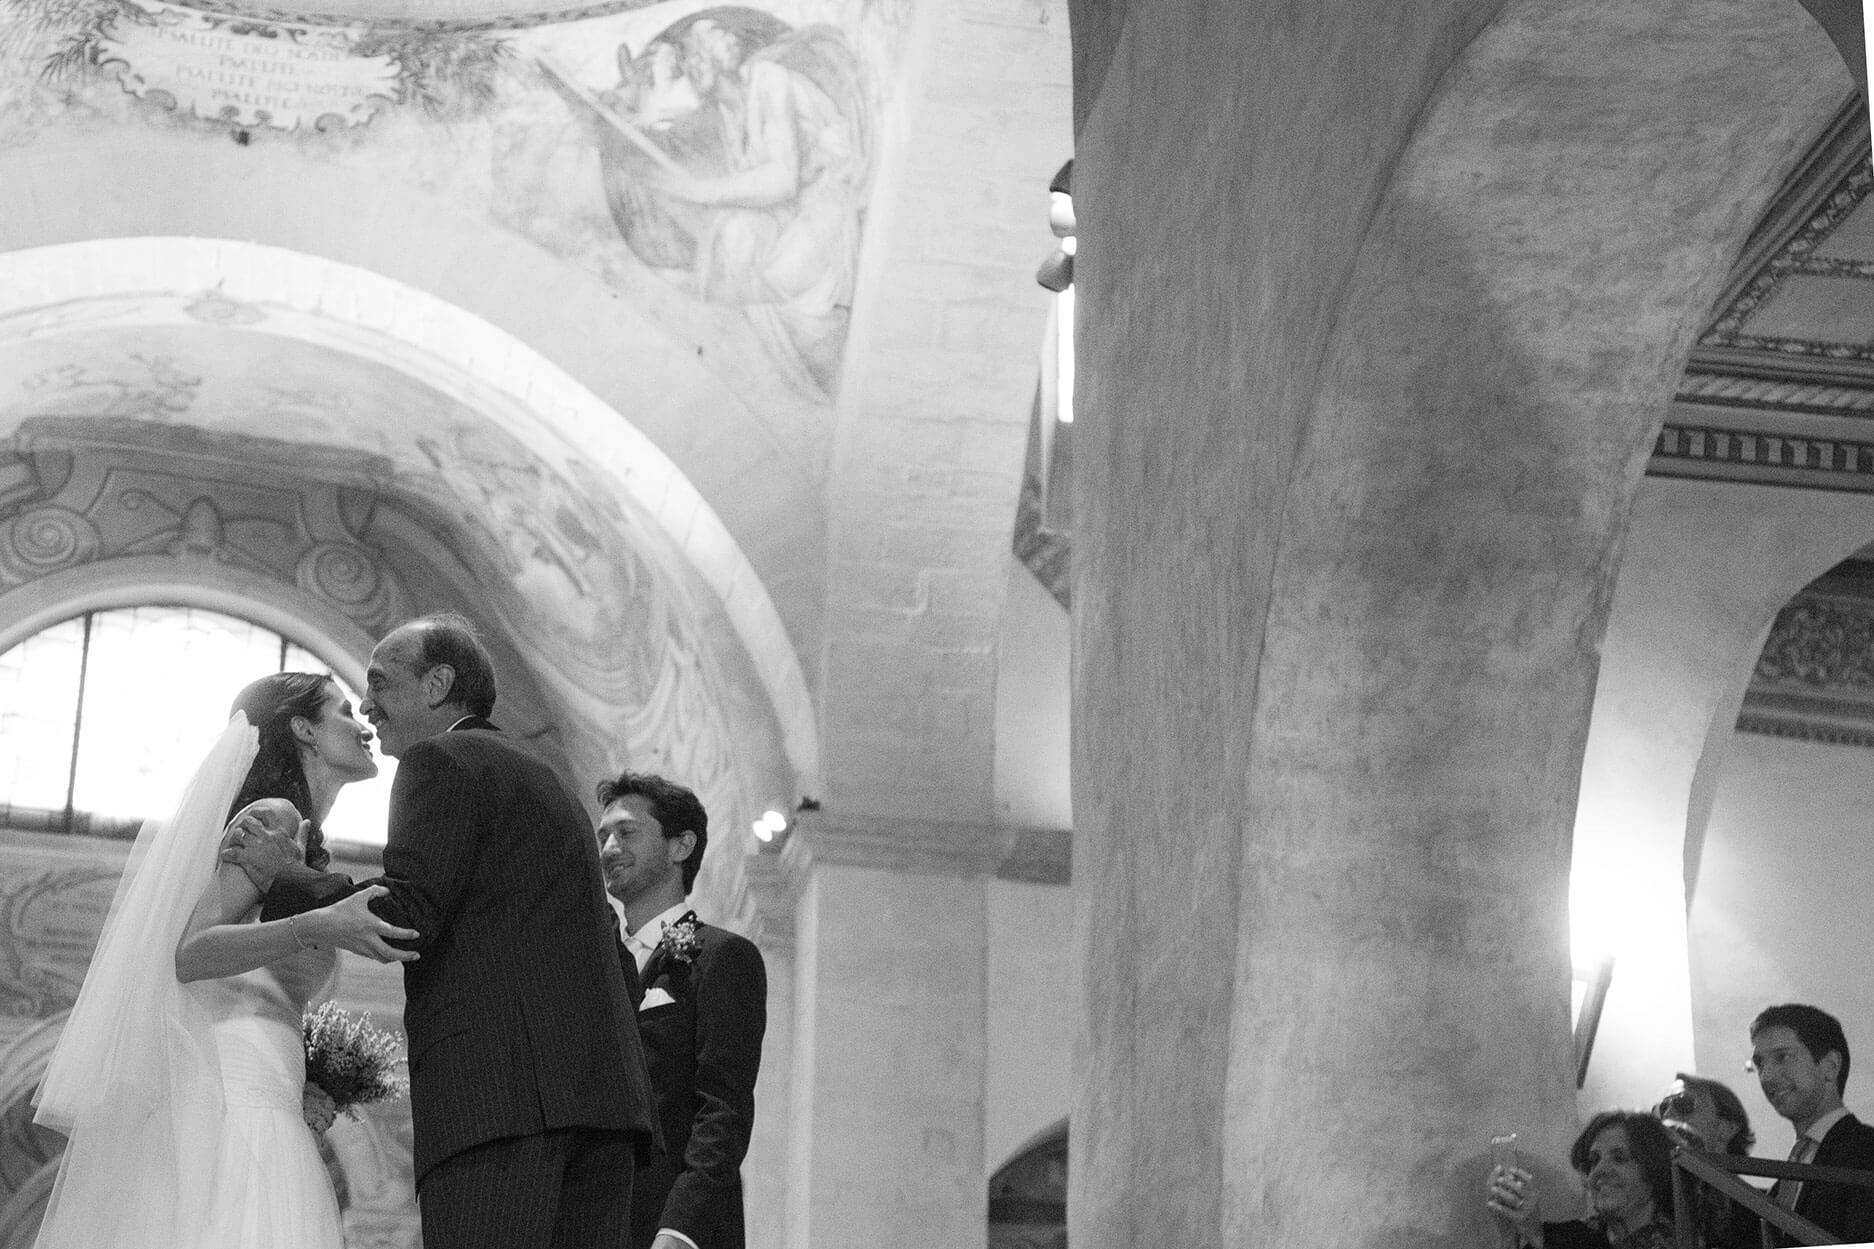 Francesca-Ferrati-wedding-photographer-Verona-Elena-Tommaso9